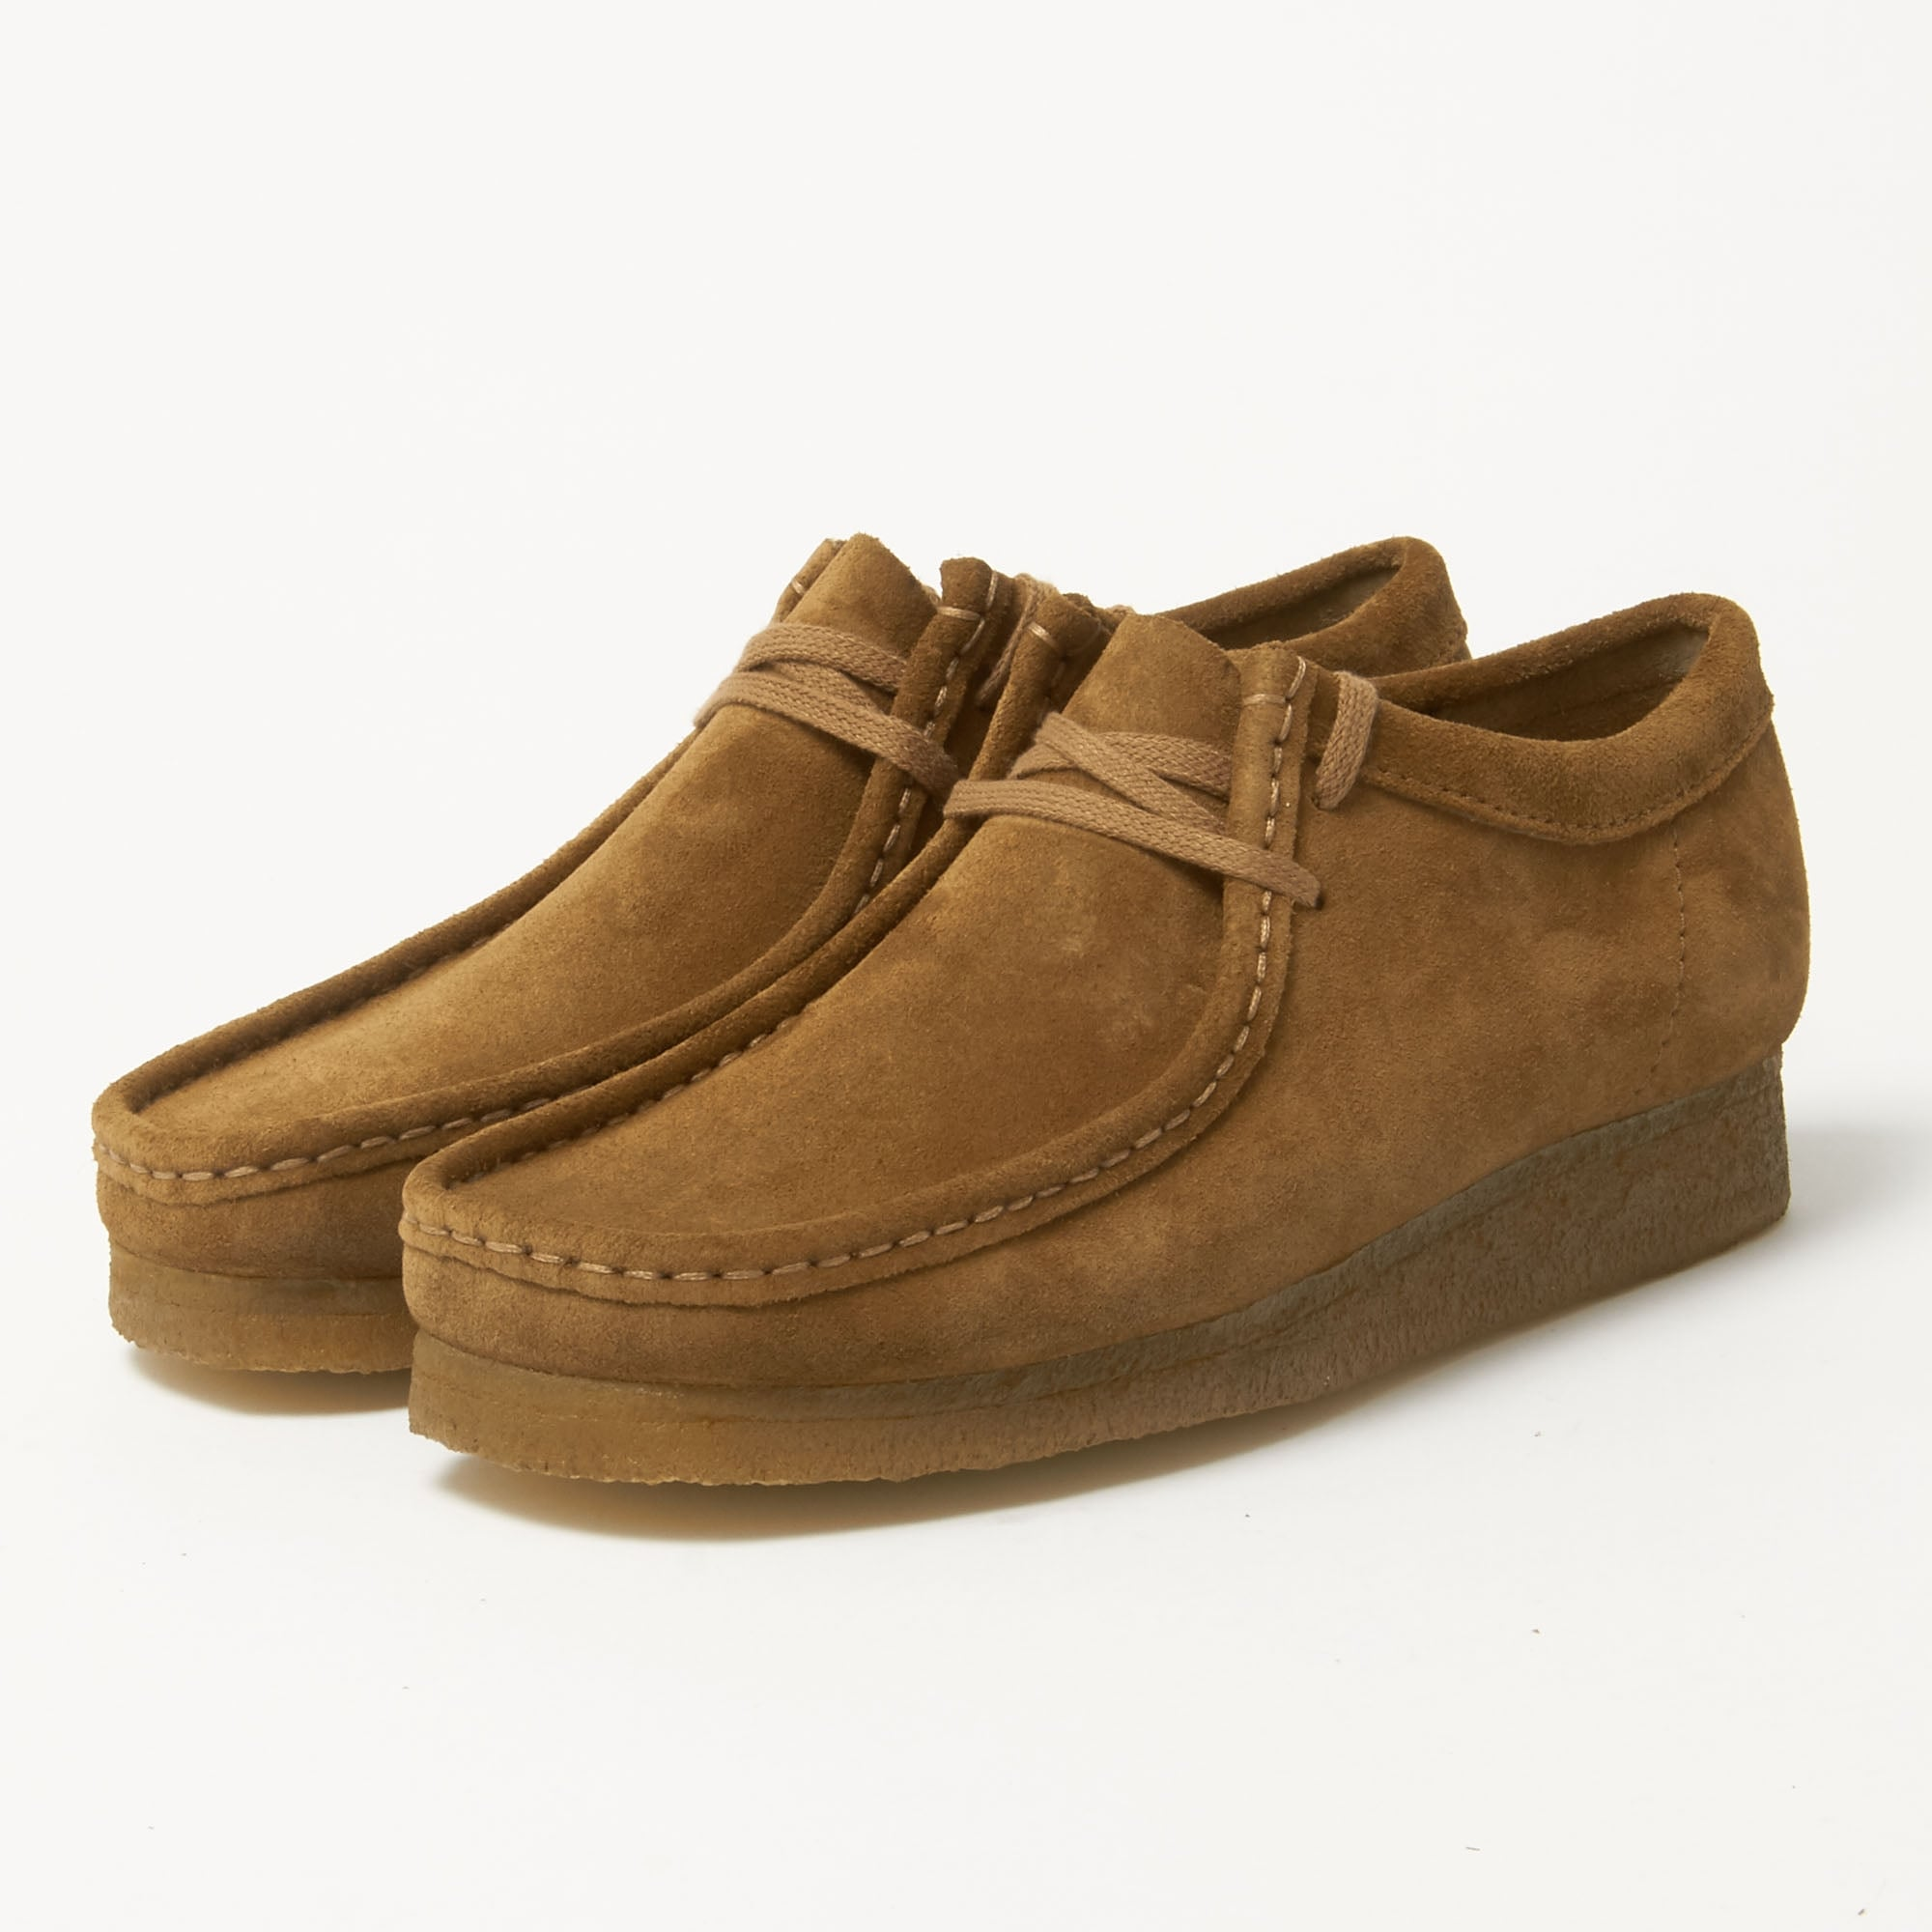 Clarks Shoes Sale  Off